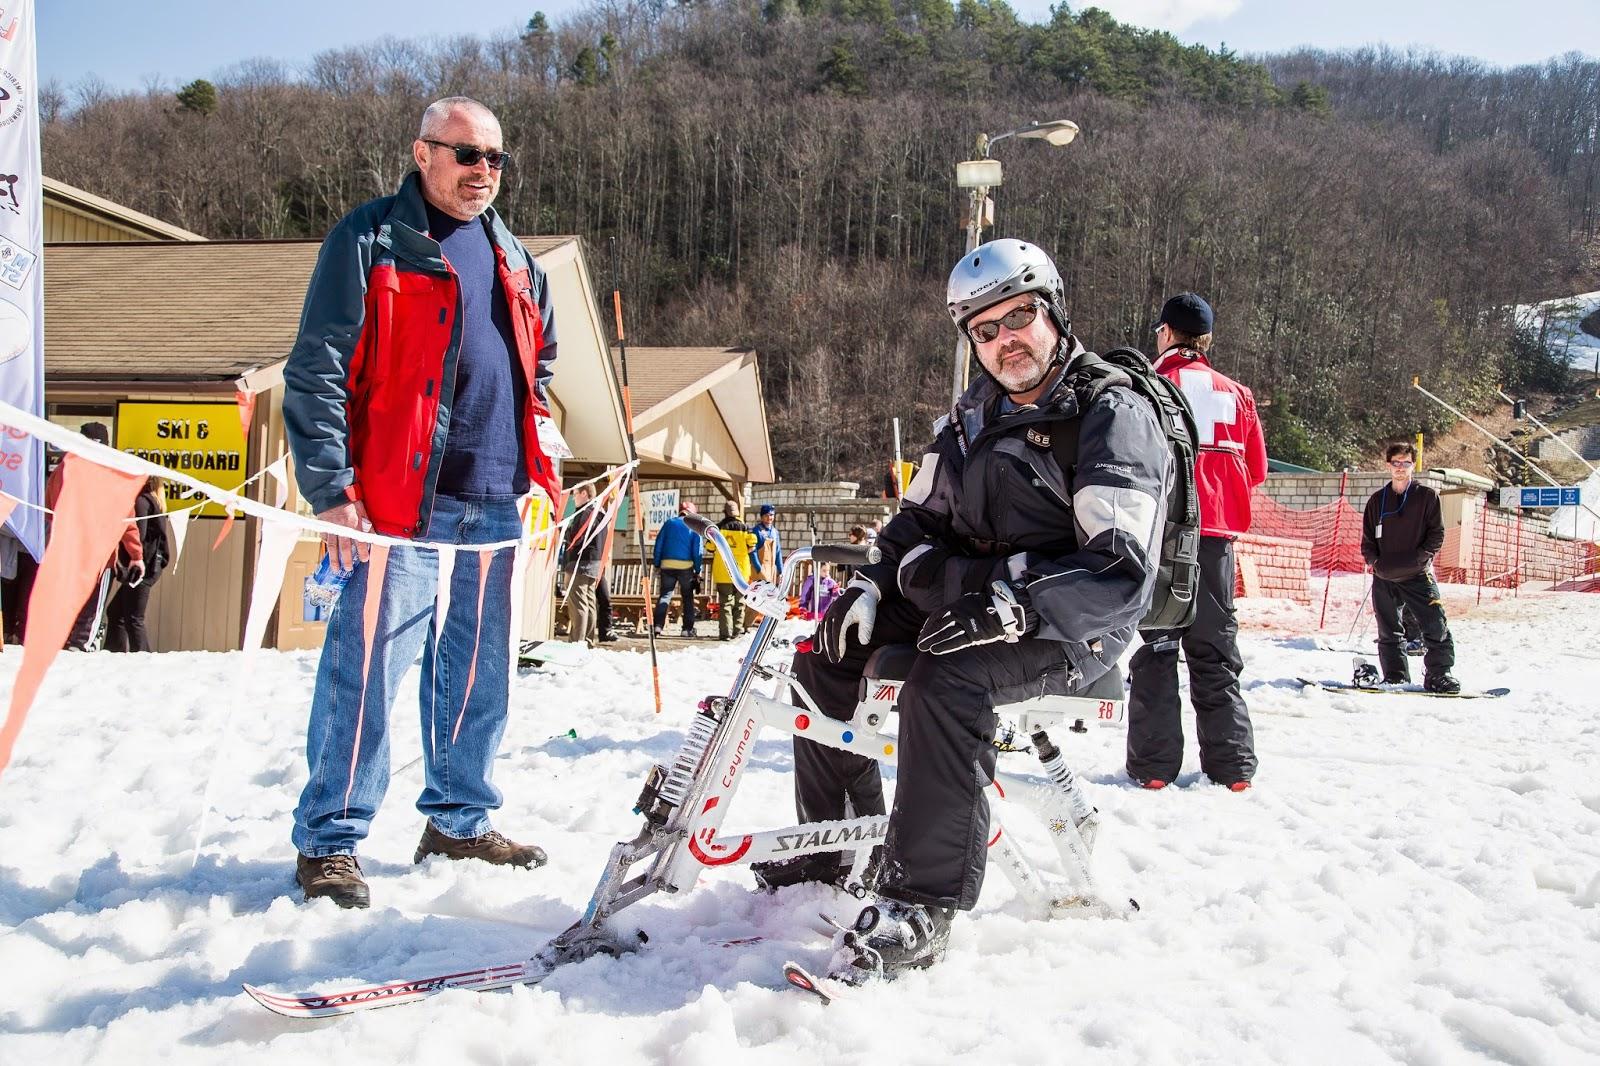 Ober Gatlinburg, Spring Fling, snowboarding, skiing, Tennessee, snowbike, snowbikes